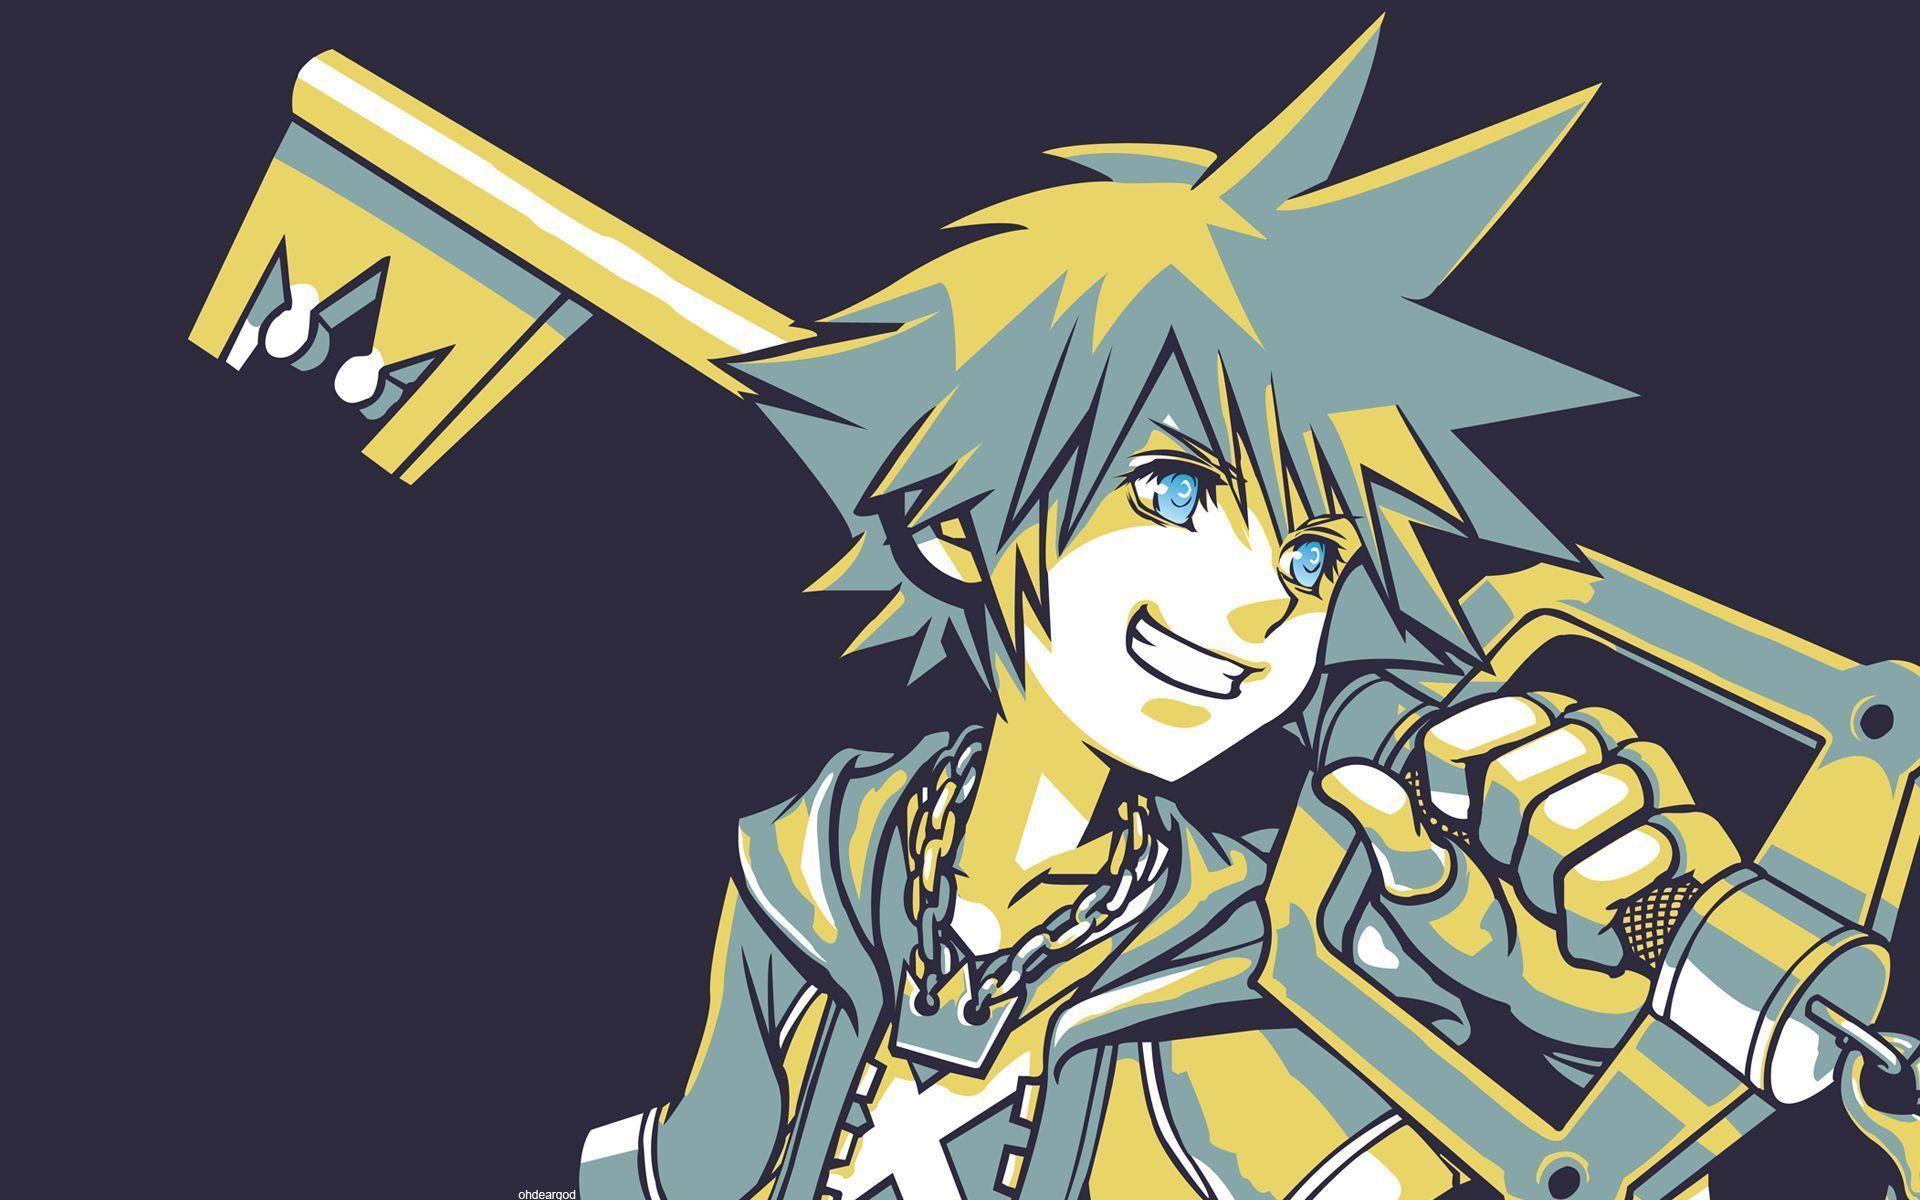 Kingdom Hearts Sora Wallpapers Top Free Kingdom Hearts Sora